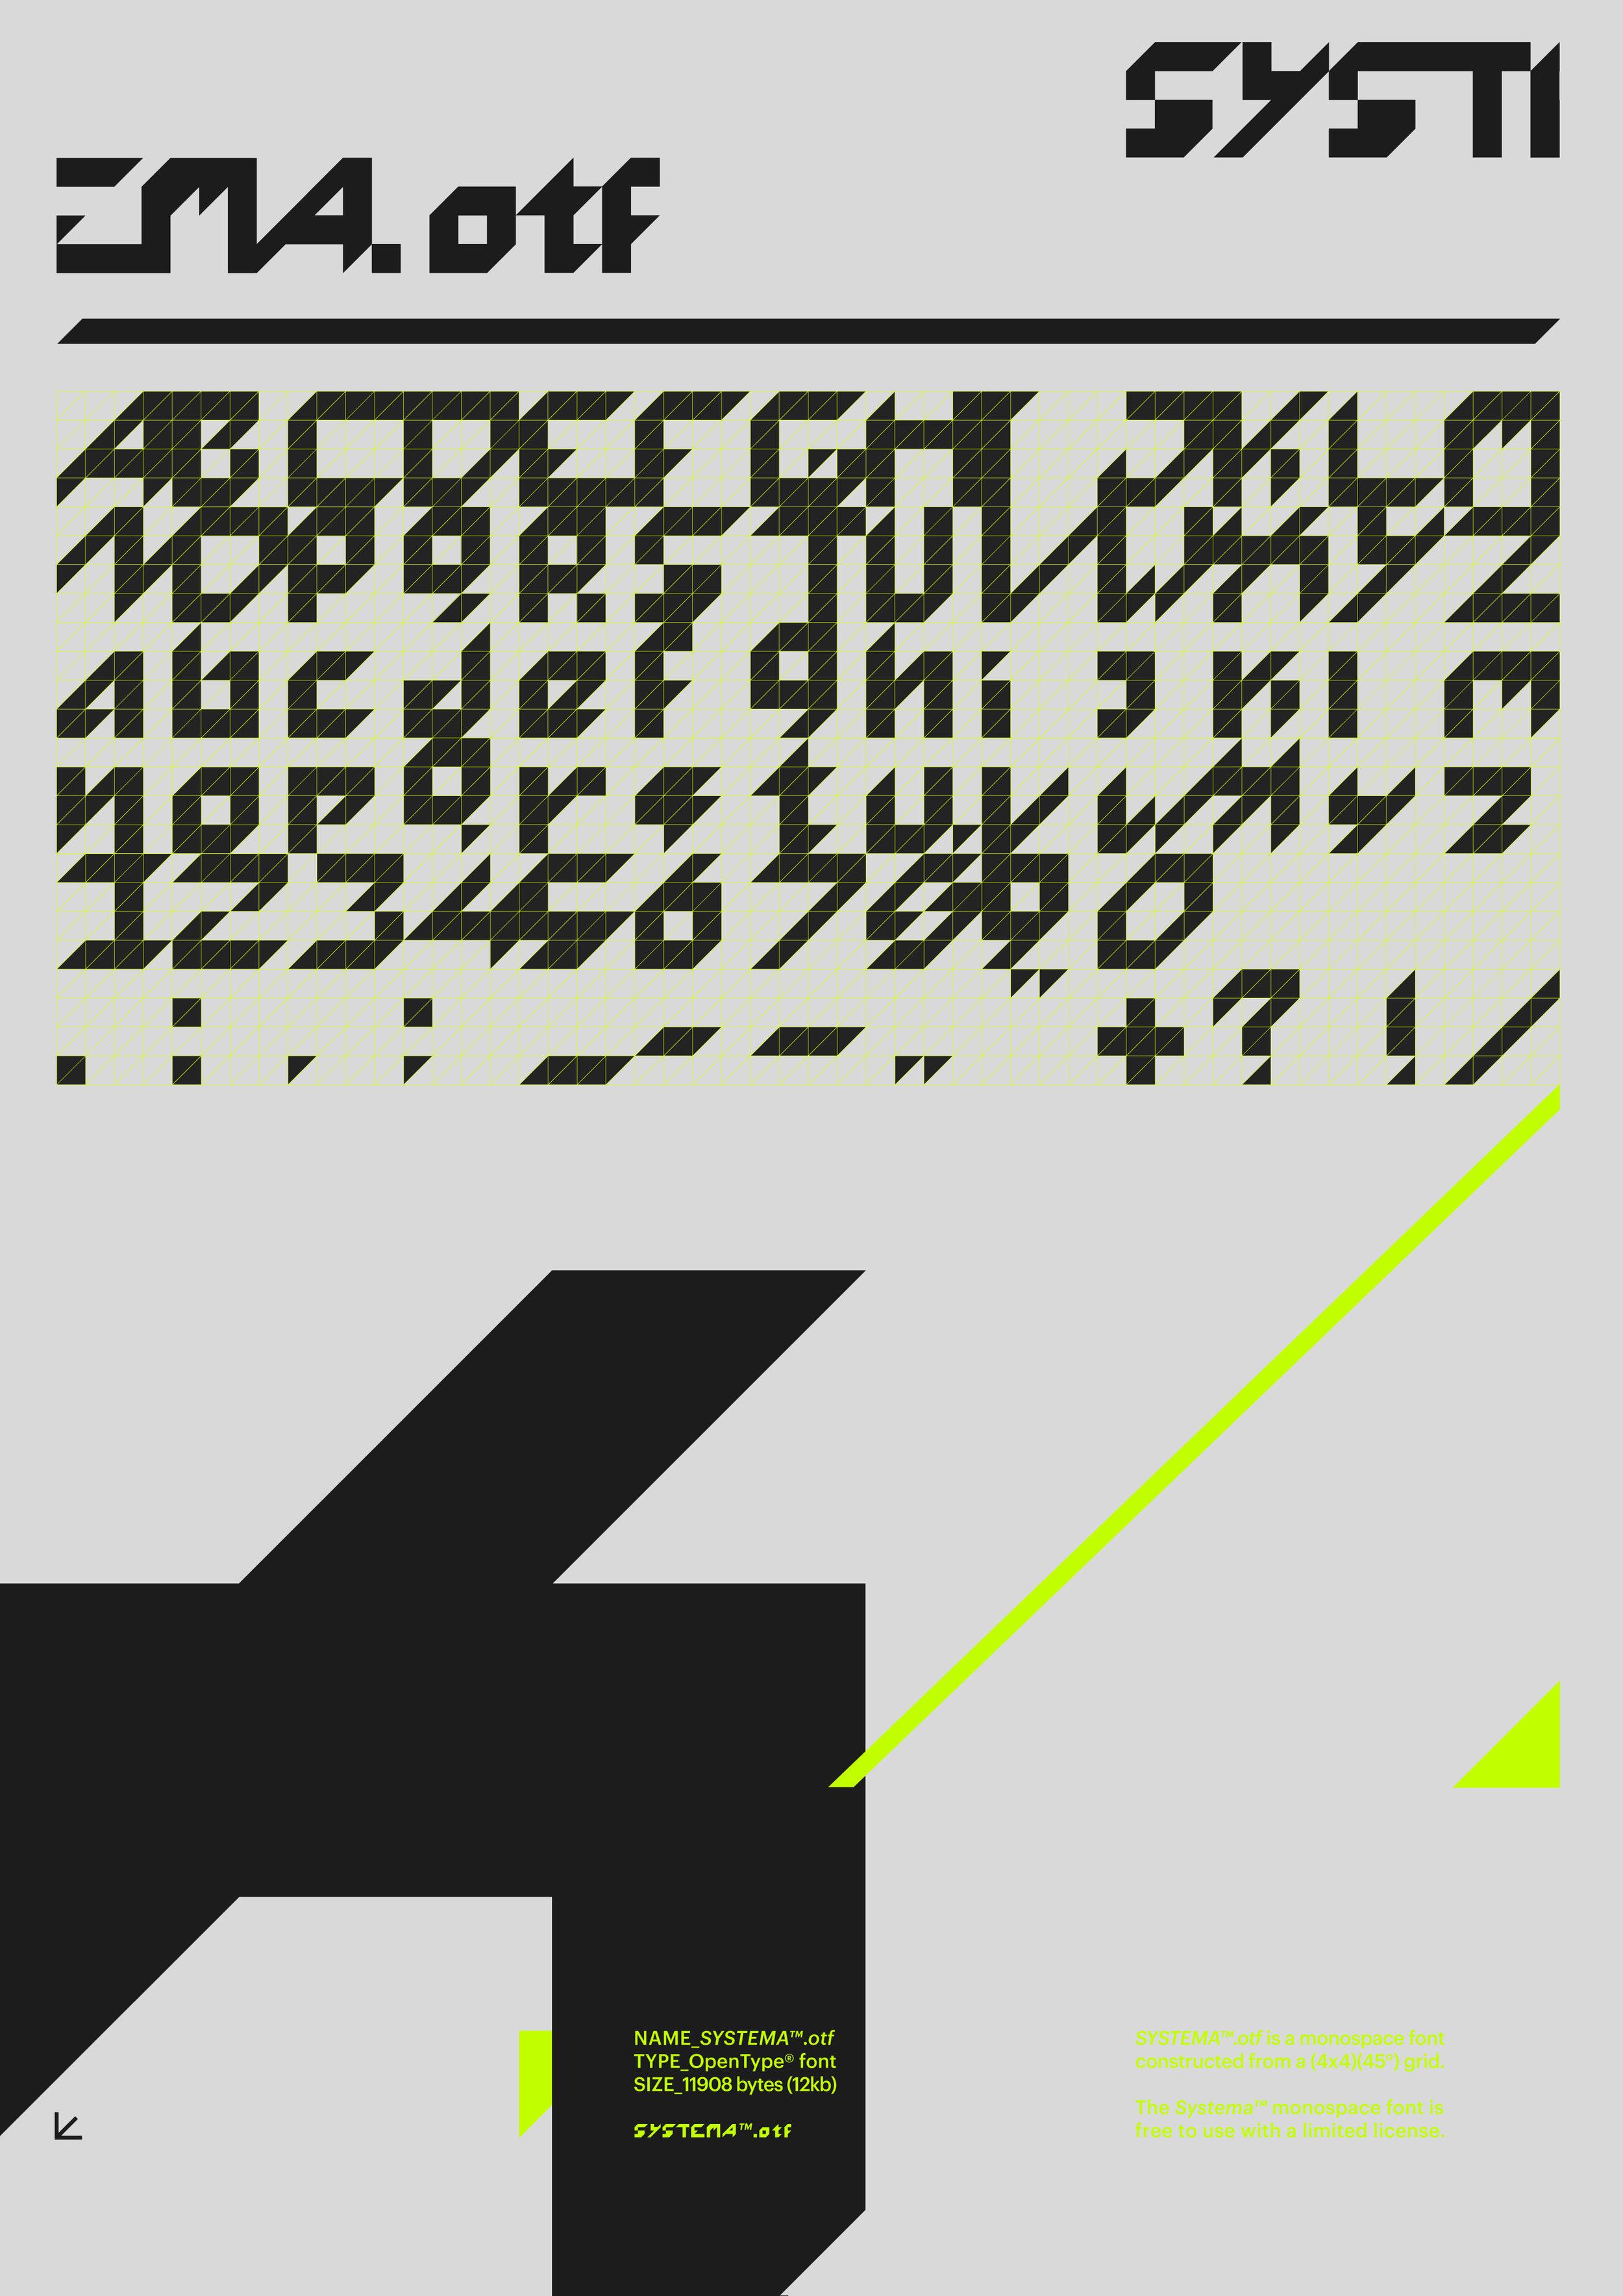 Systema_Poster_Final copy.jpg